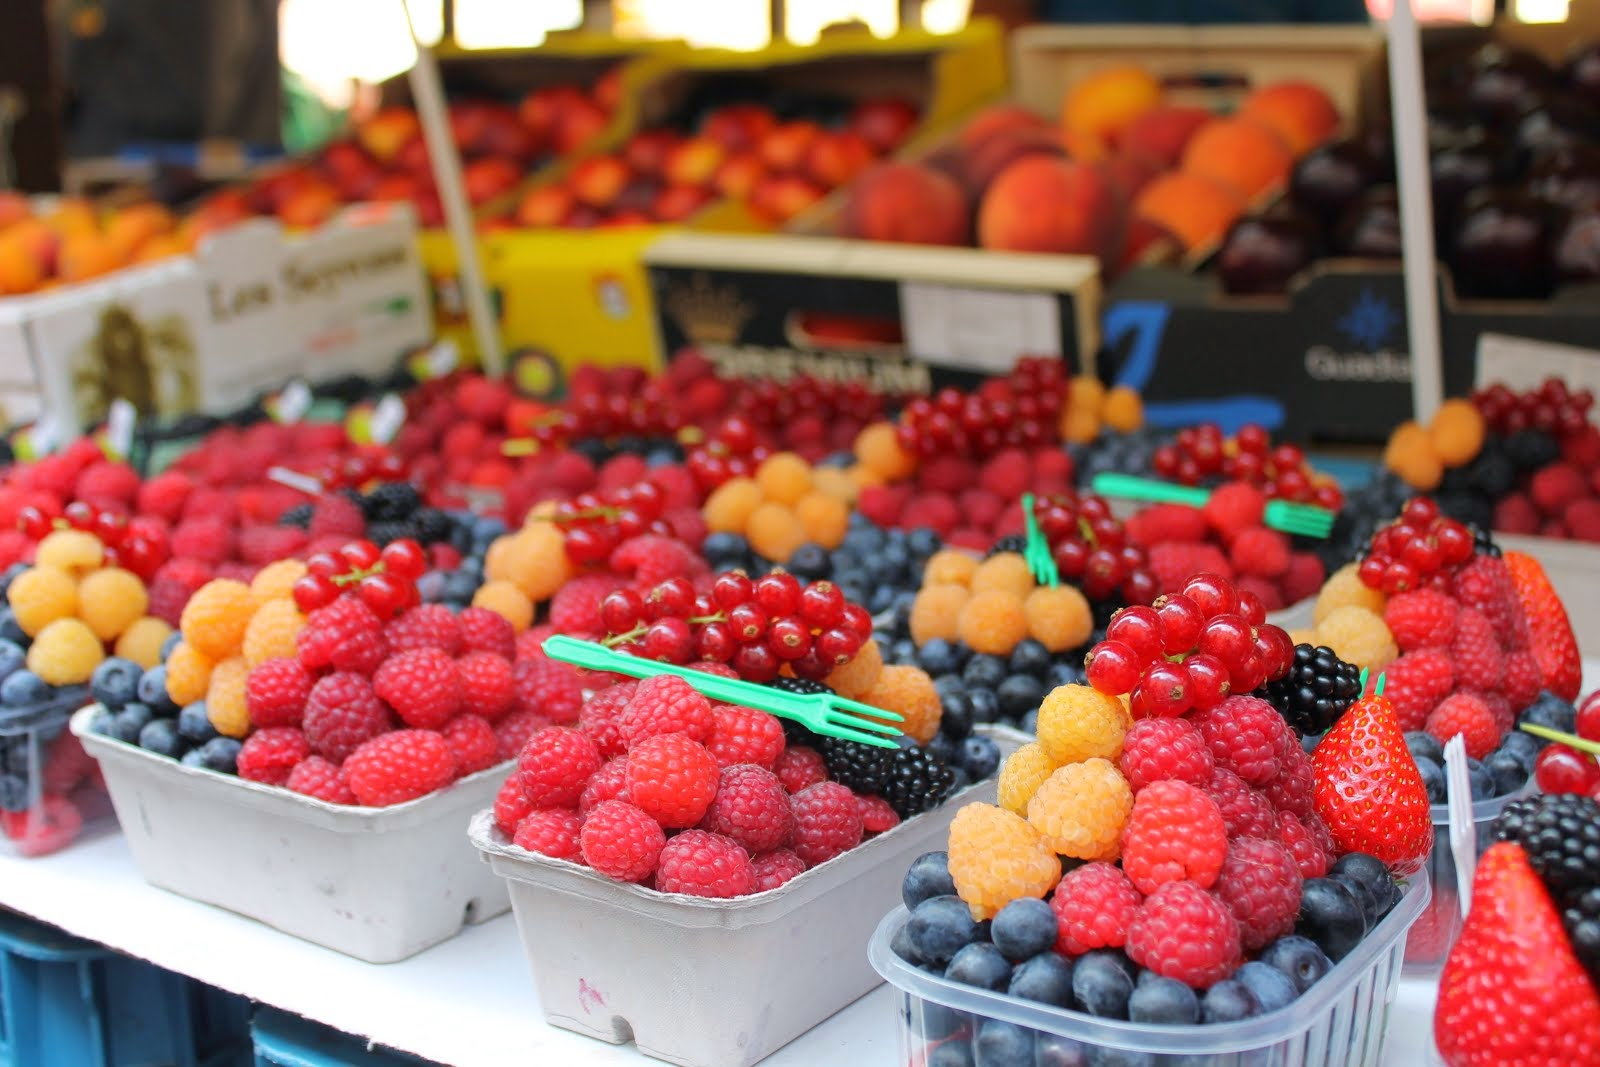 Prague fruit market